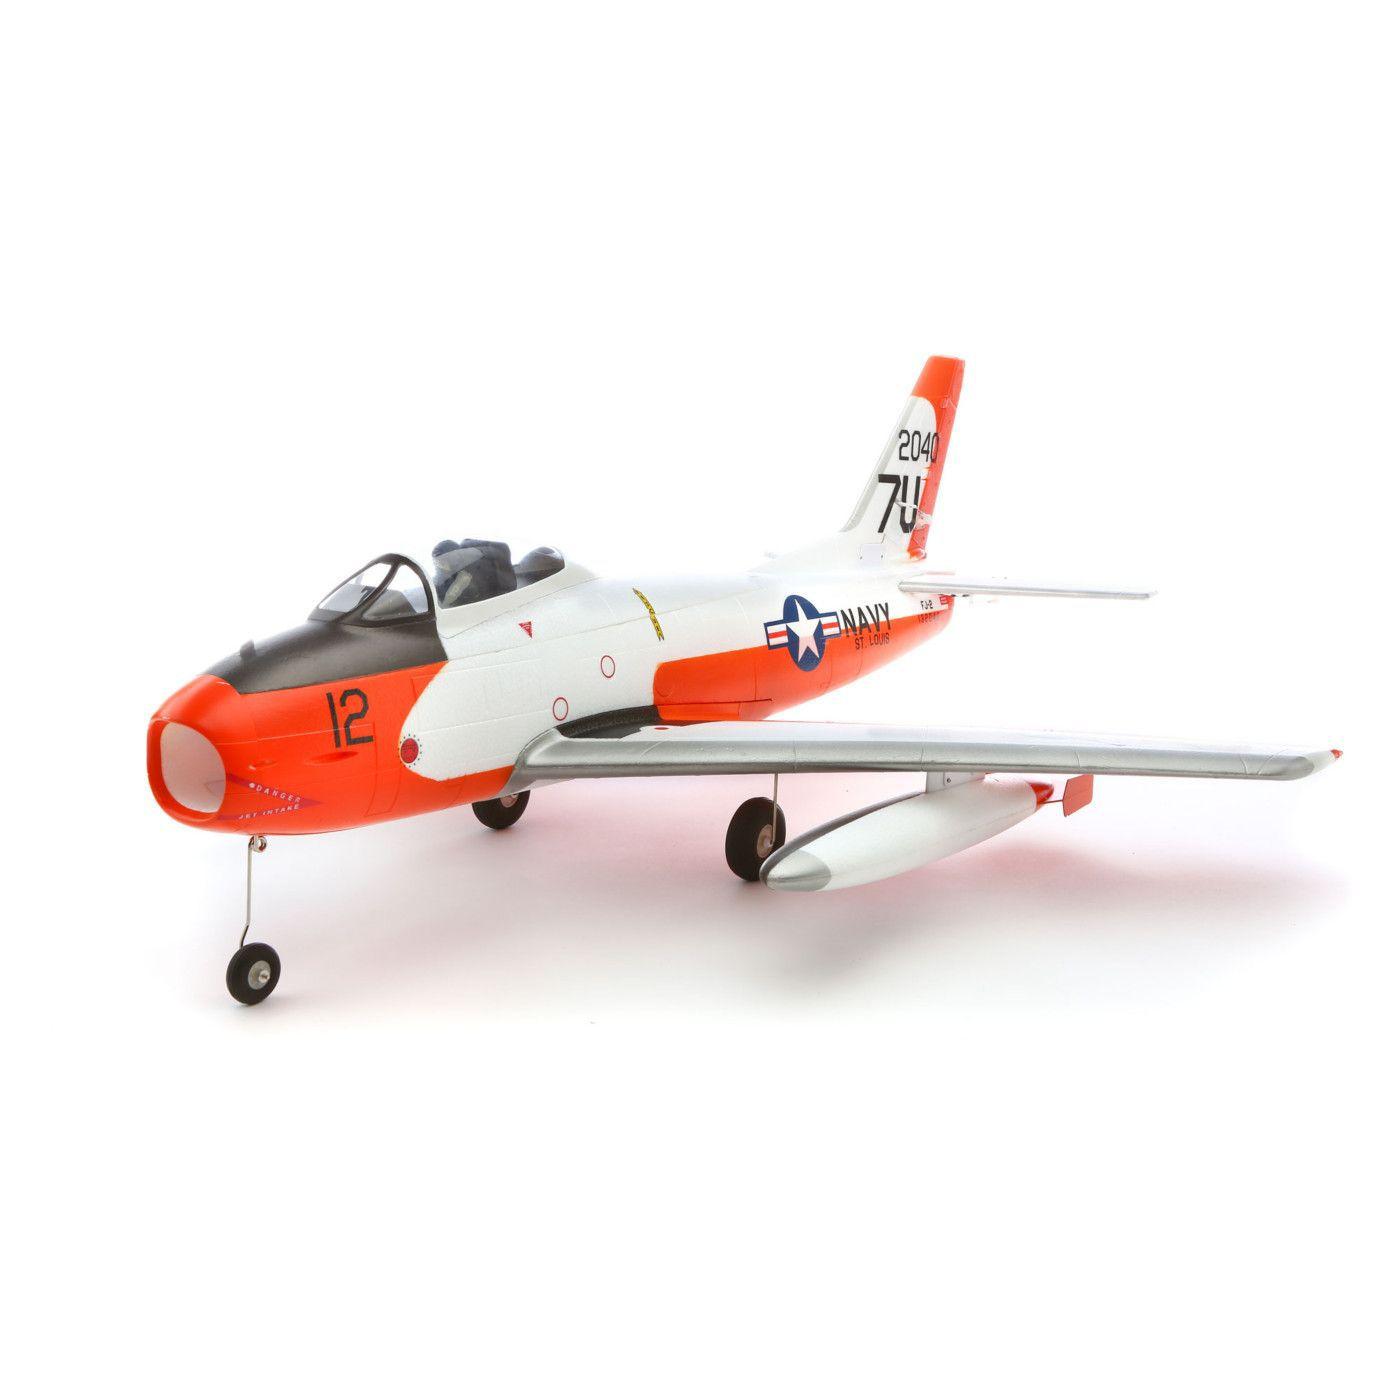 FJ-2 Fury E-flite